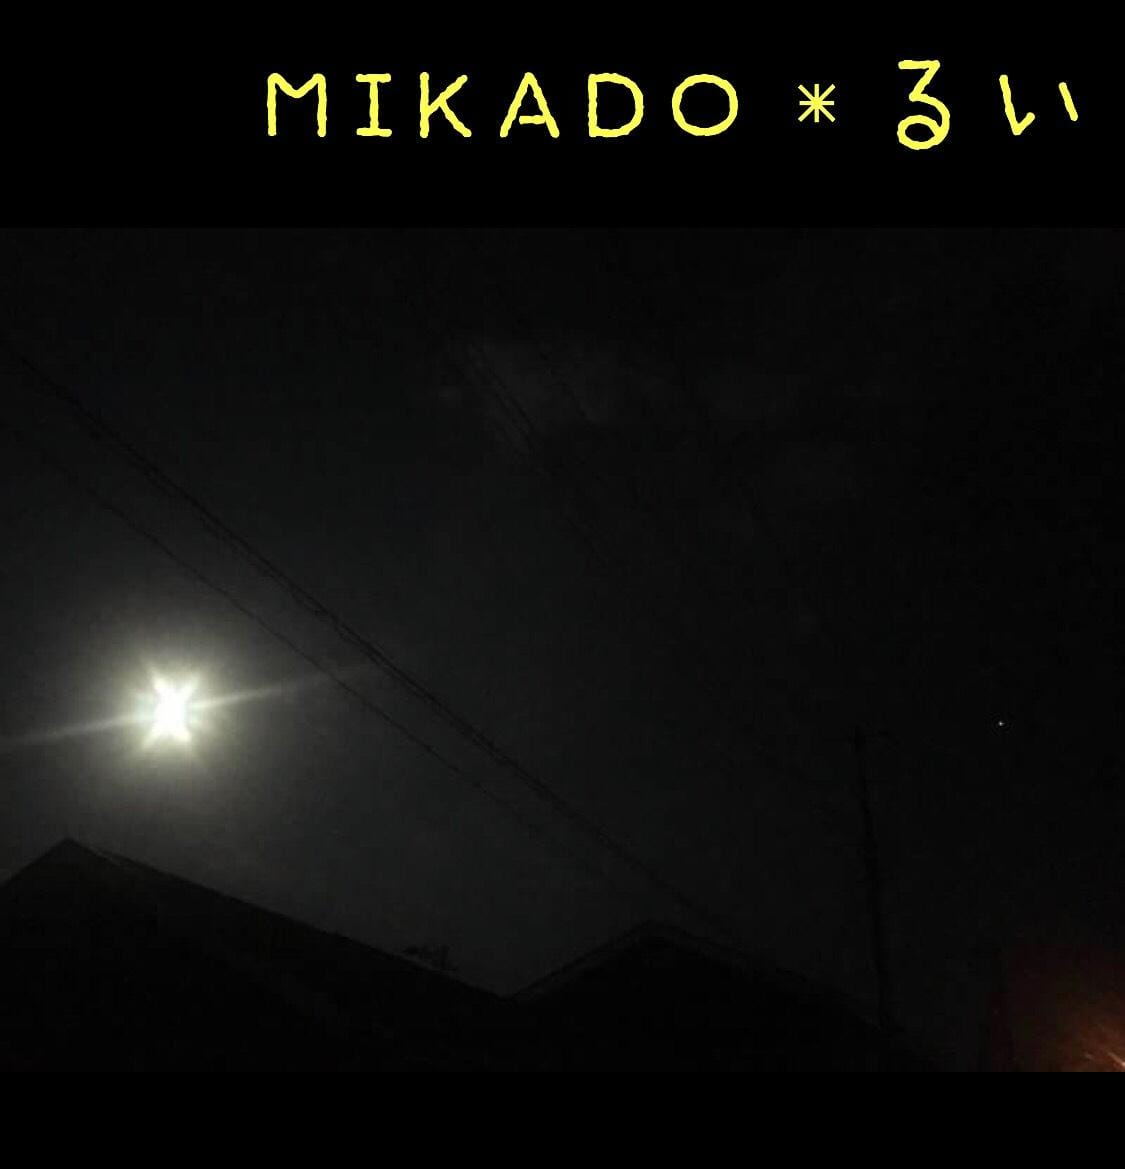 「❇︎MIKADO❇︎火星」08/01(水) 03:11   るいの写メ・風俗動画